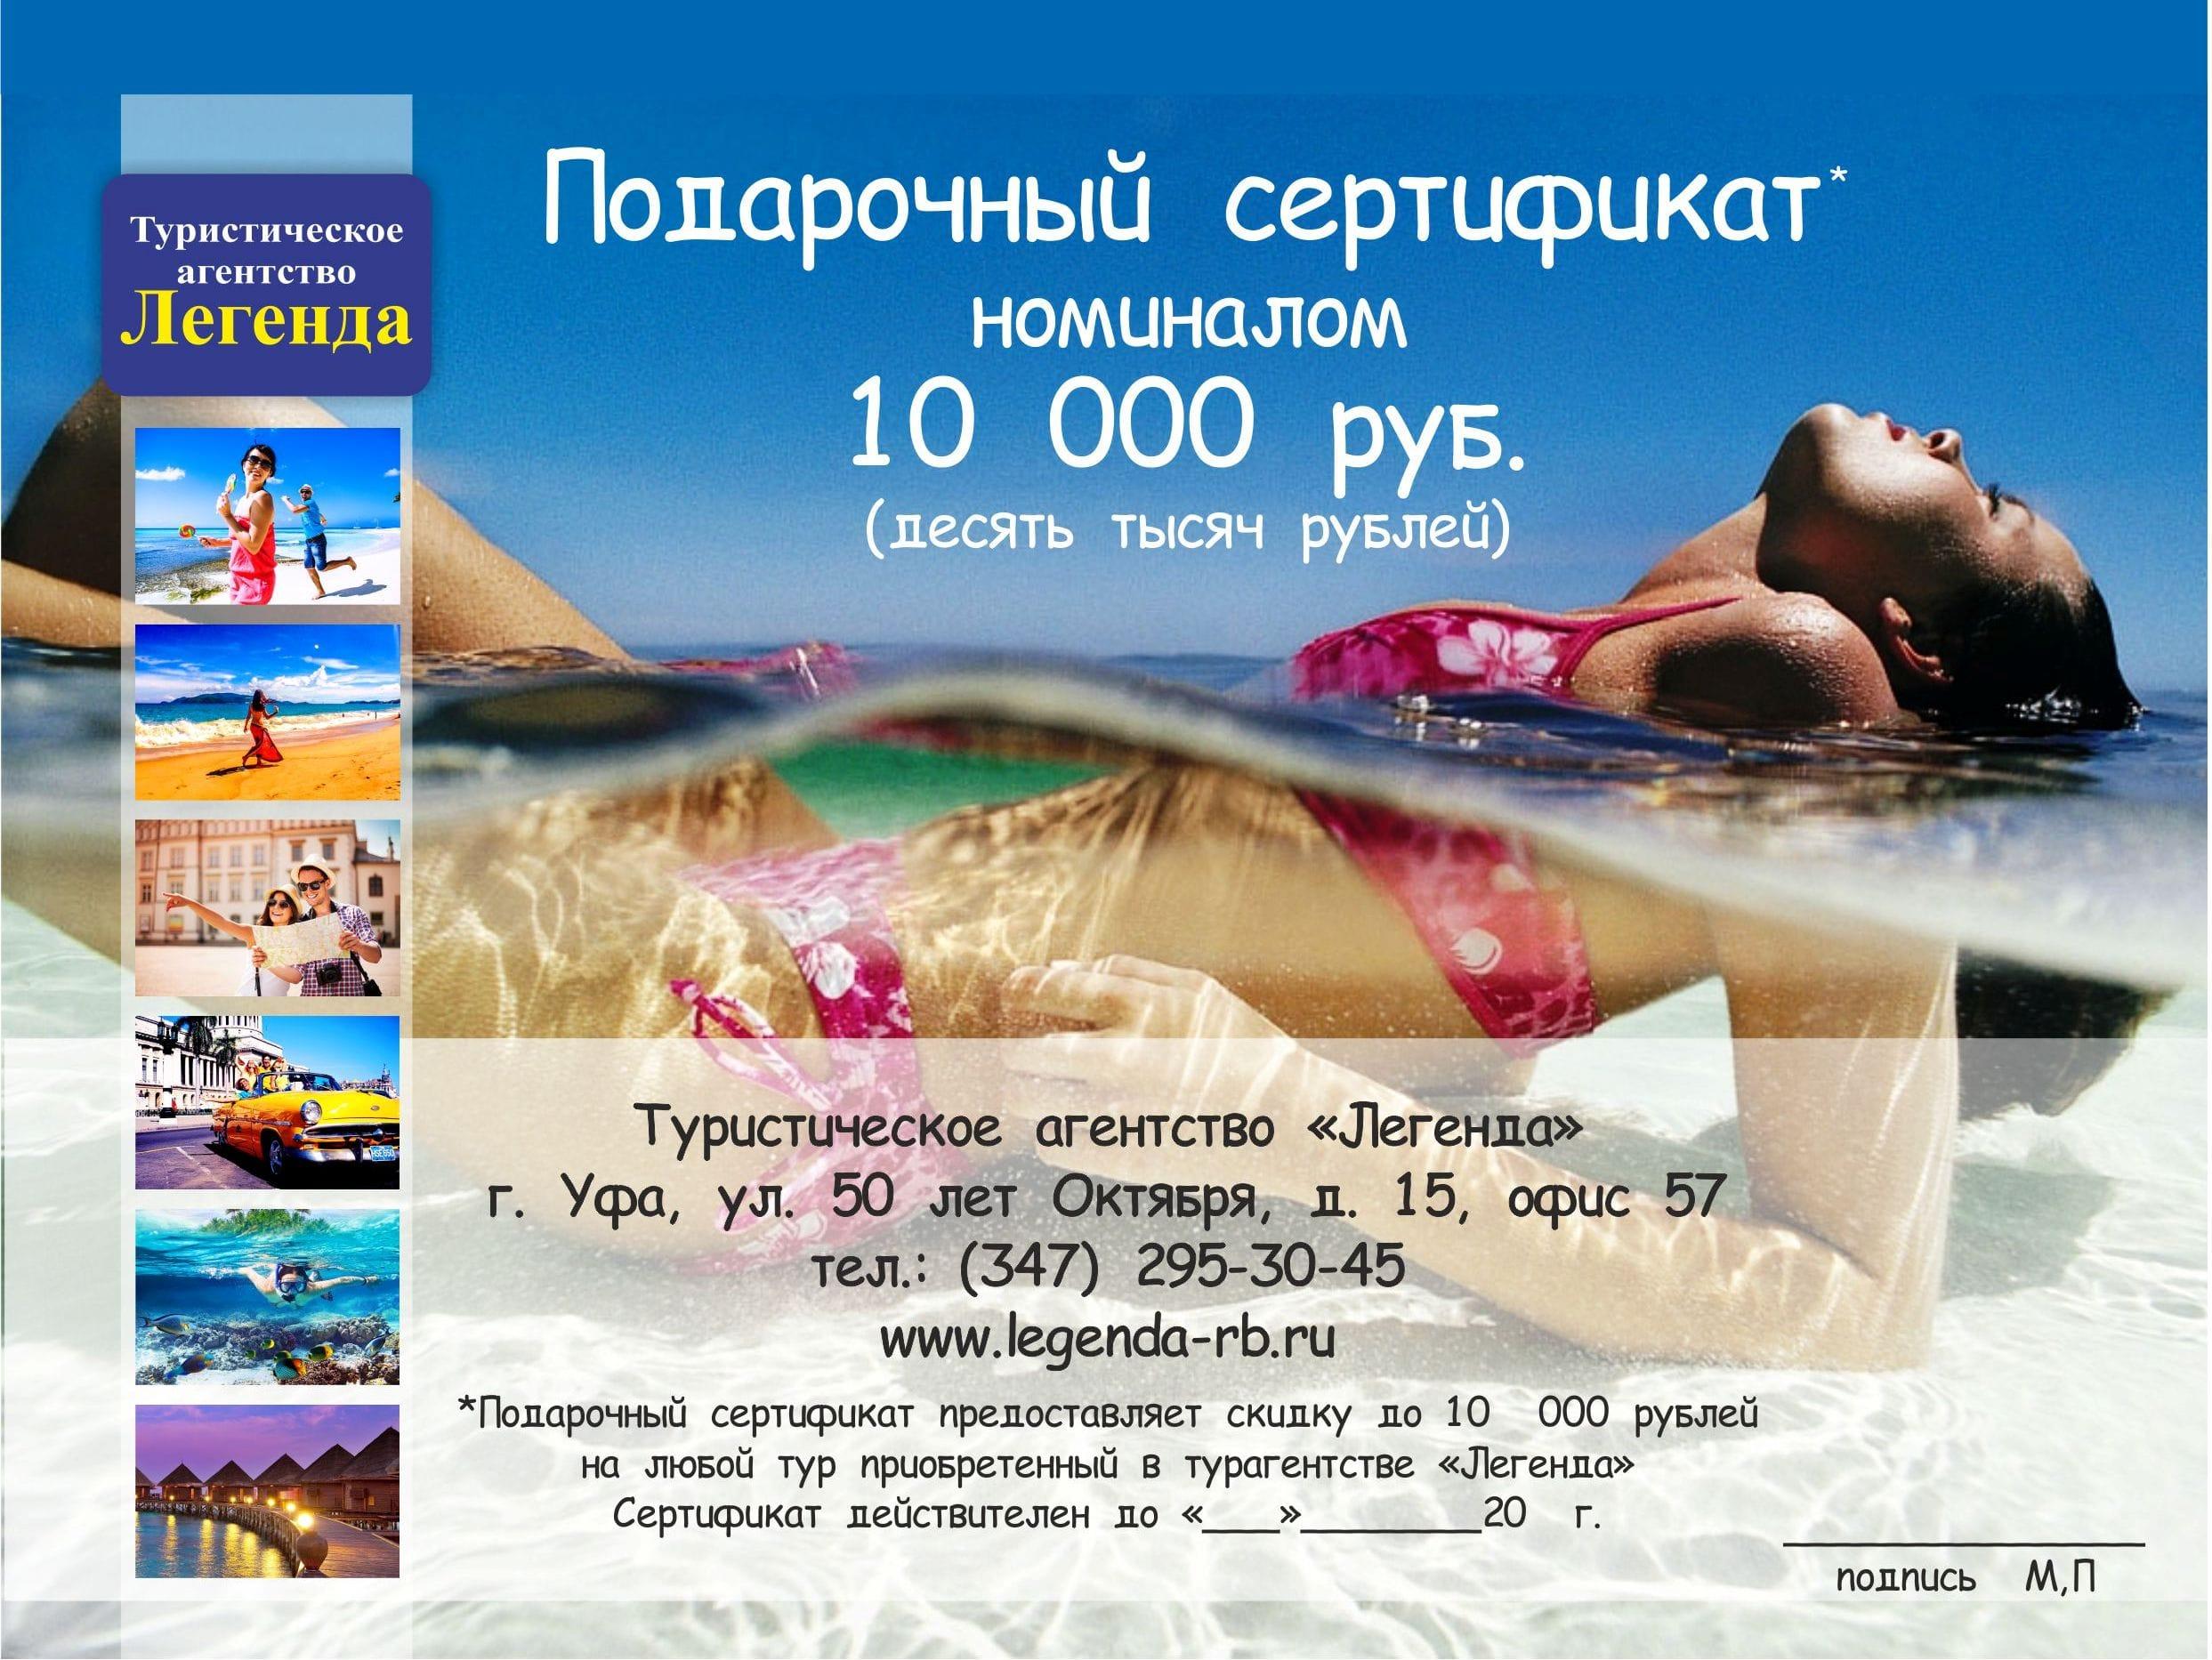 tur vo vetnam nyachang 45 469 rub chel - Тур во Вьетнам Нячанг 45 469 руб. чел.